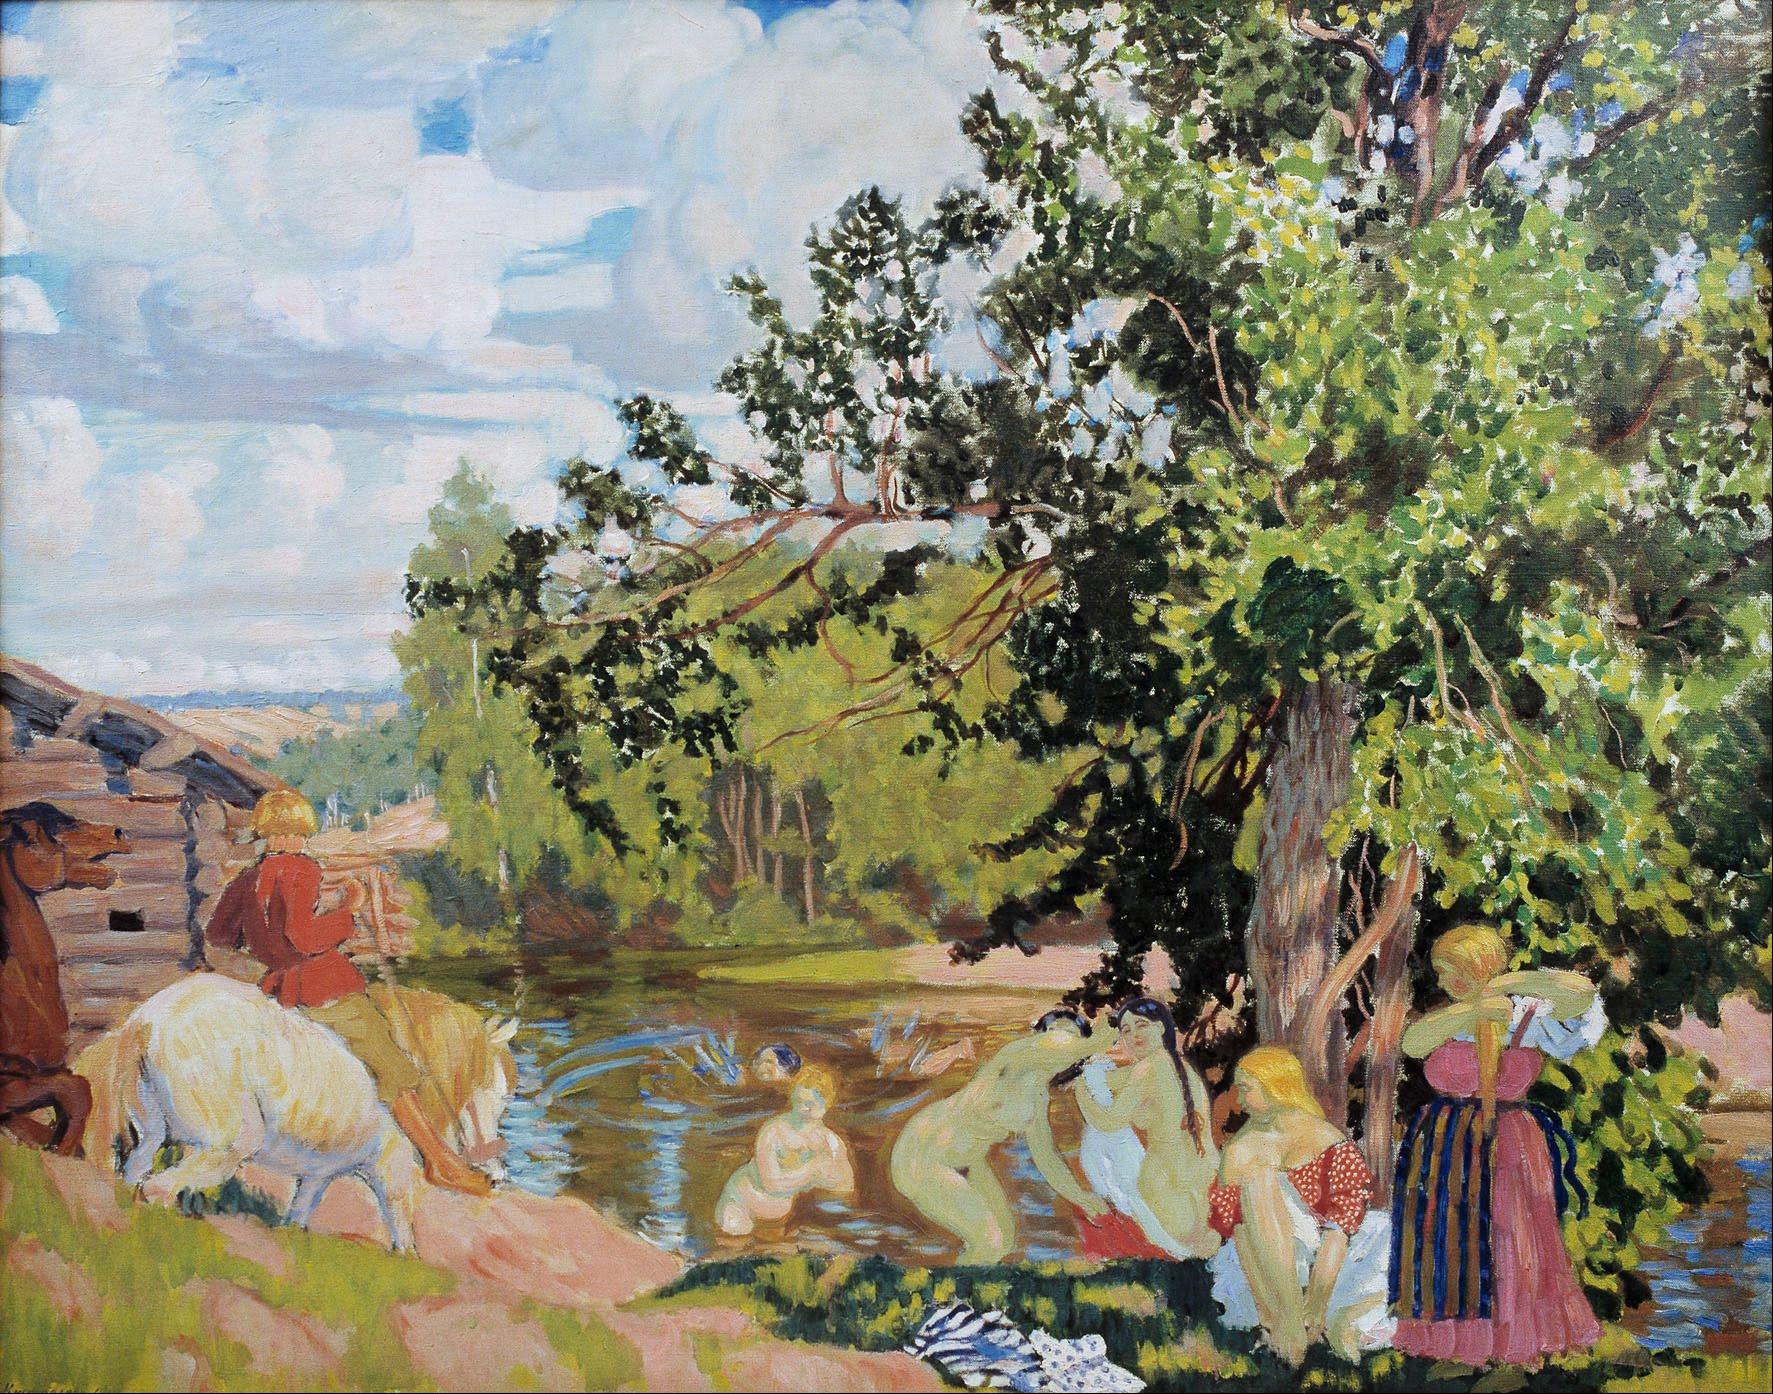 Artist Boris Kustodiev: biography, creativity. Boris Mikhailovich Kustodiev 62